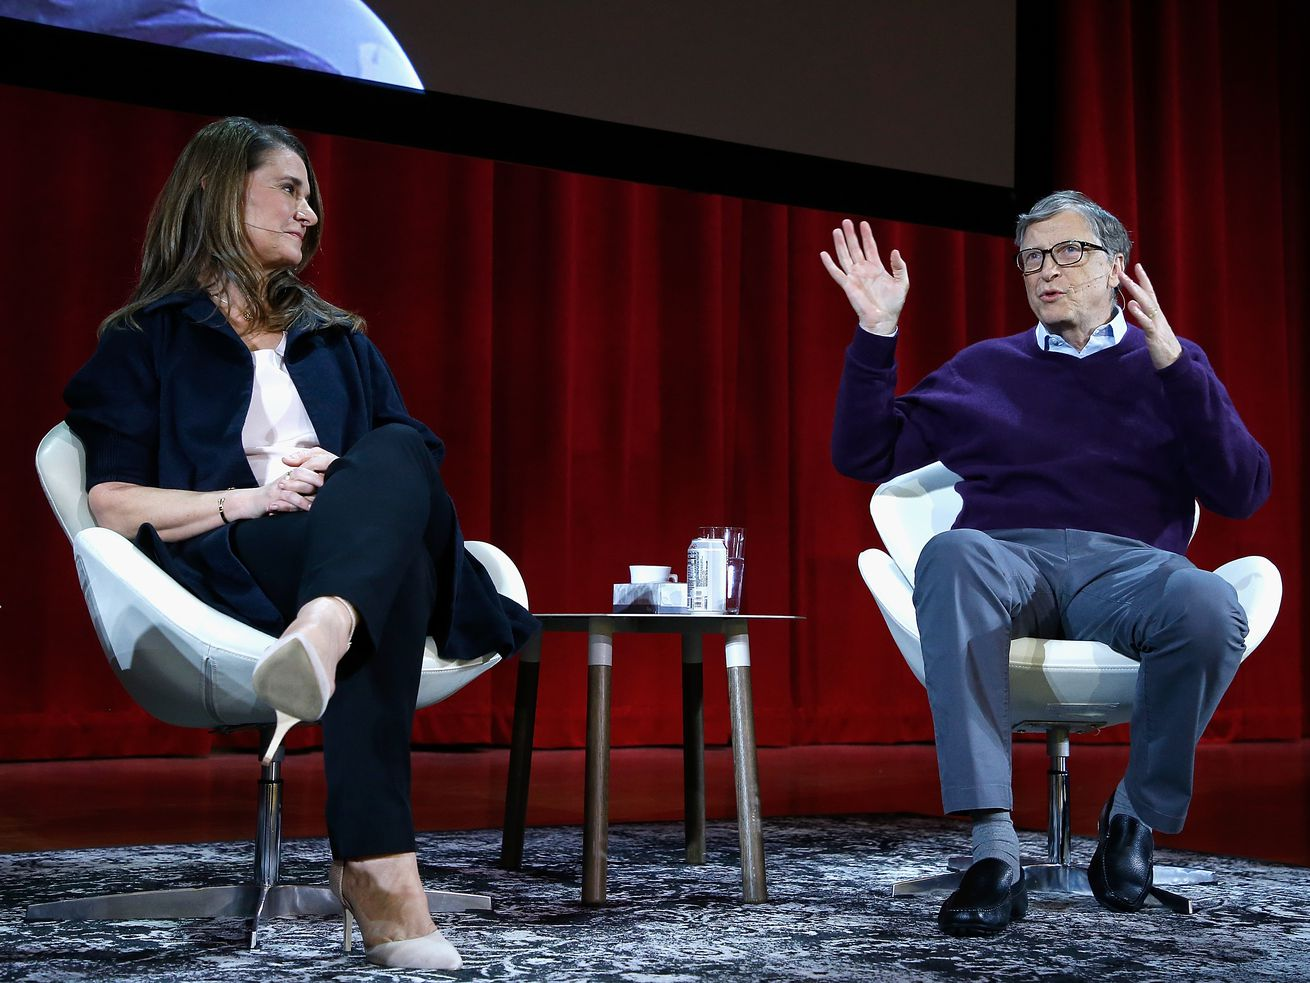 Melinda and Bill Gates speak at Hunter College on February 13, 2018, in New York City.